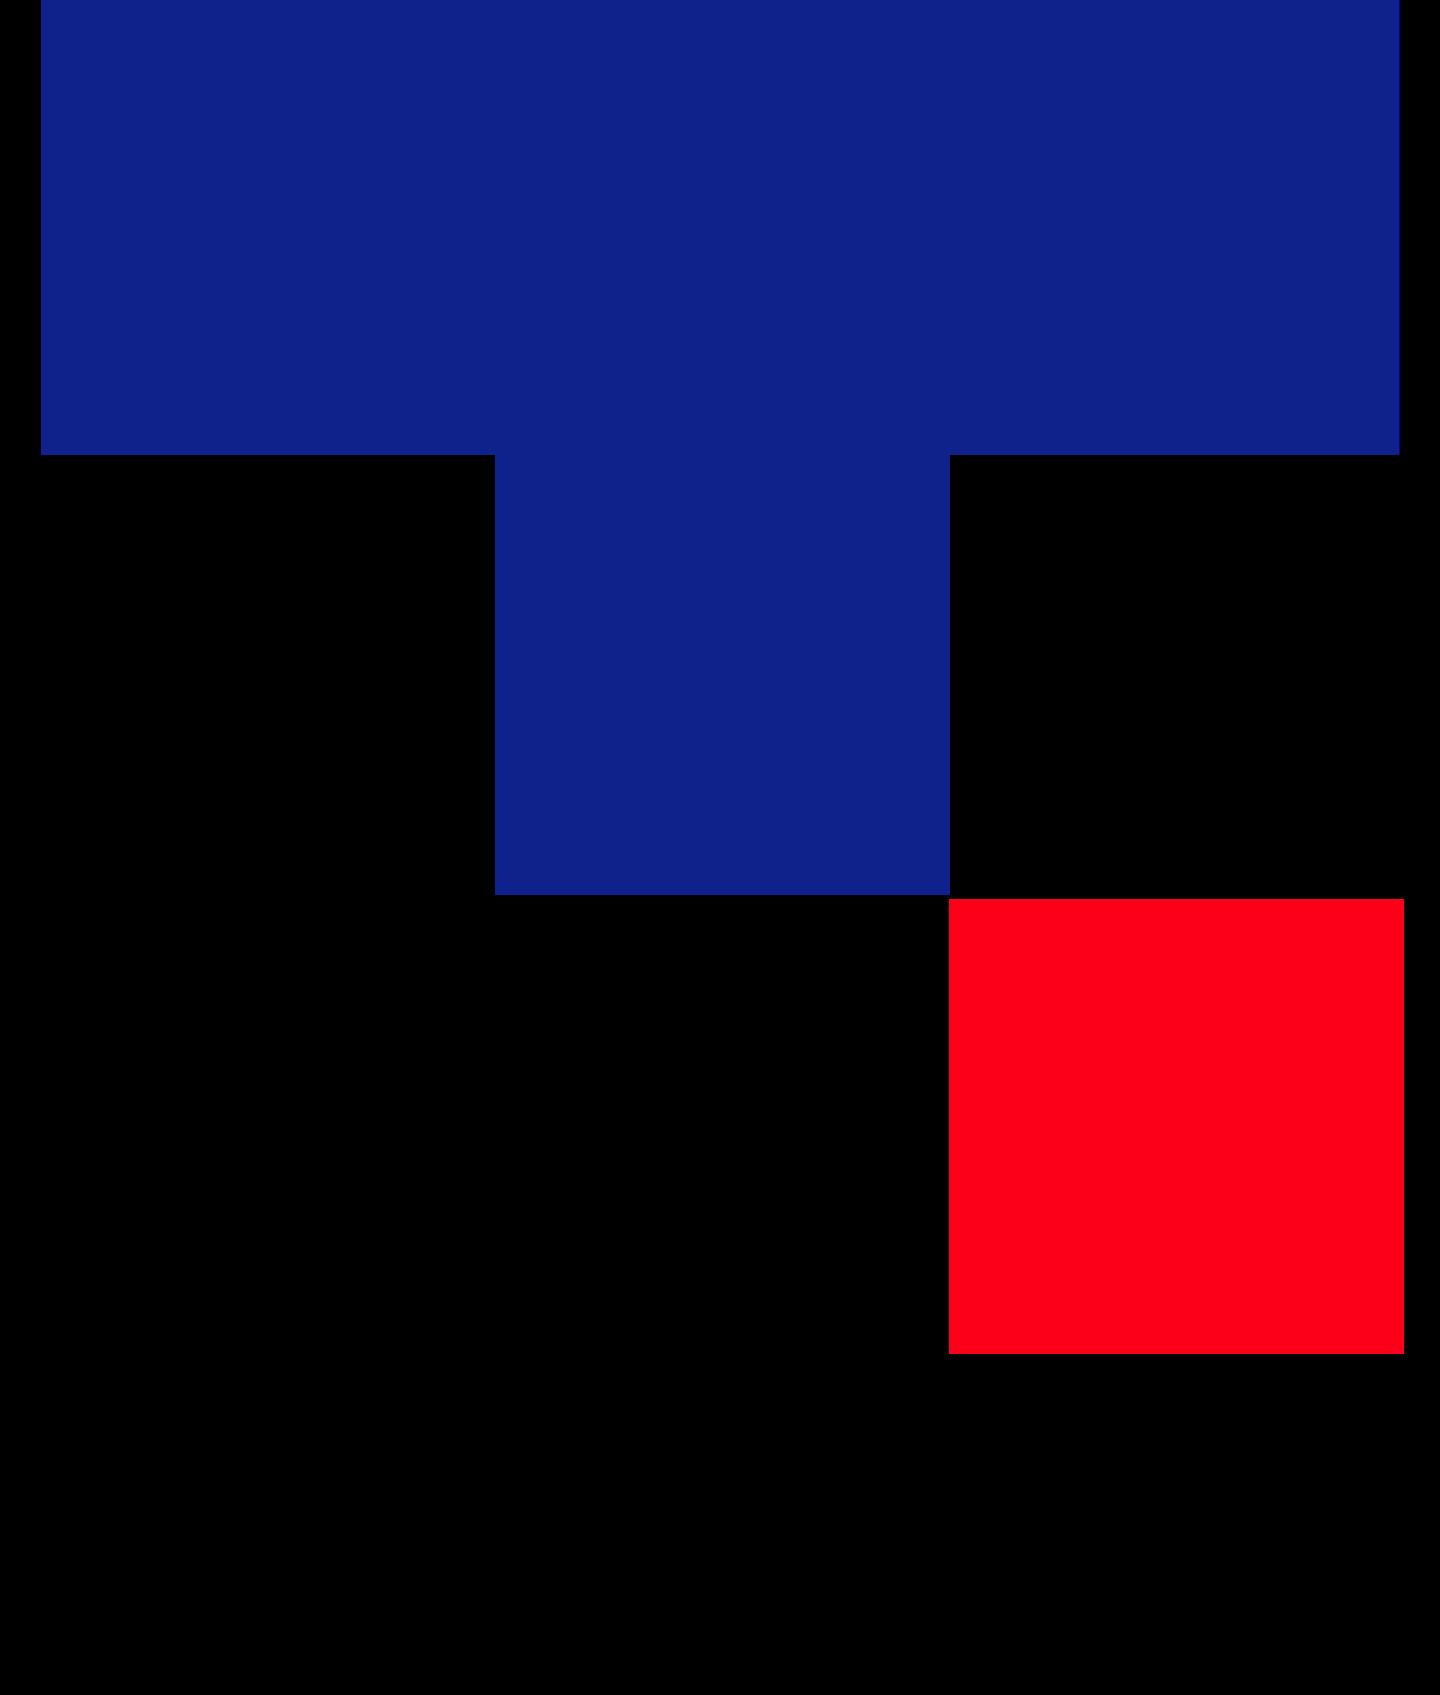 tokyo gas logo 3 - Tokyo Gas Logo